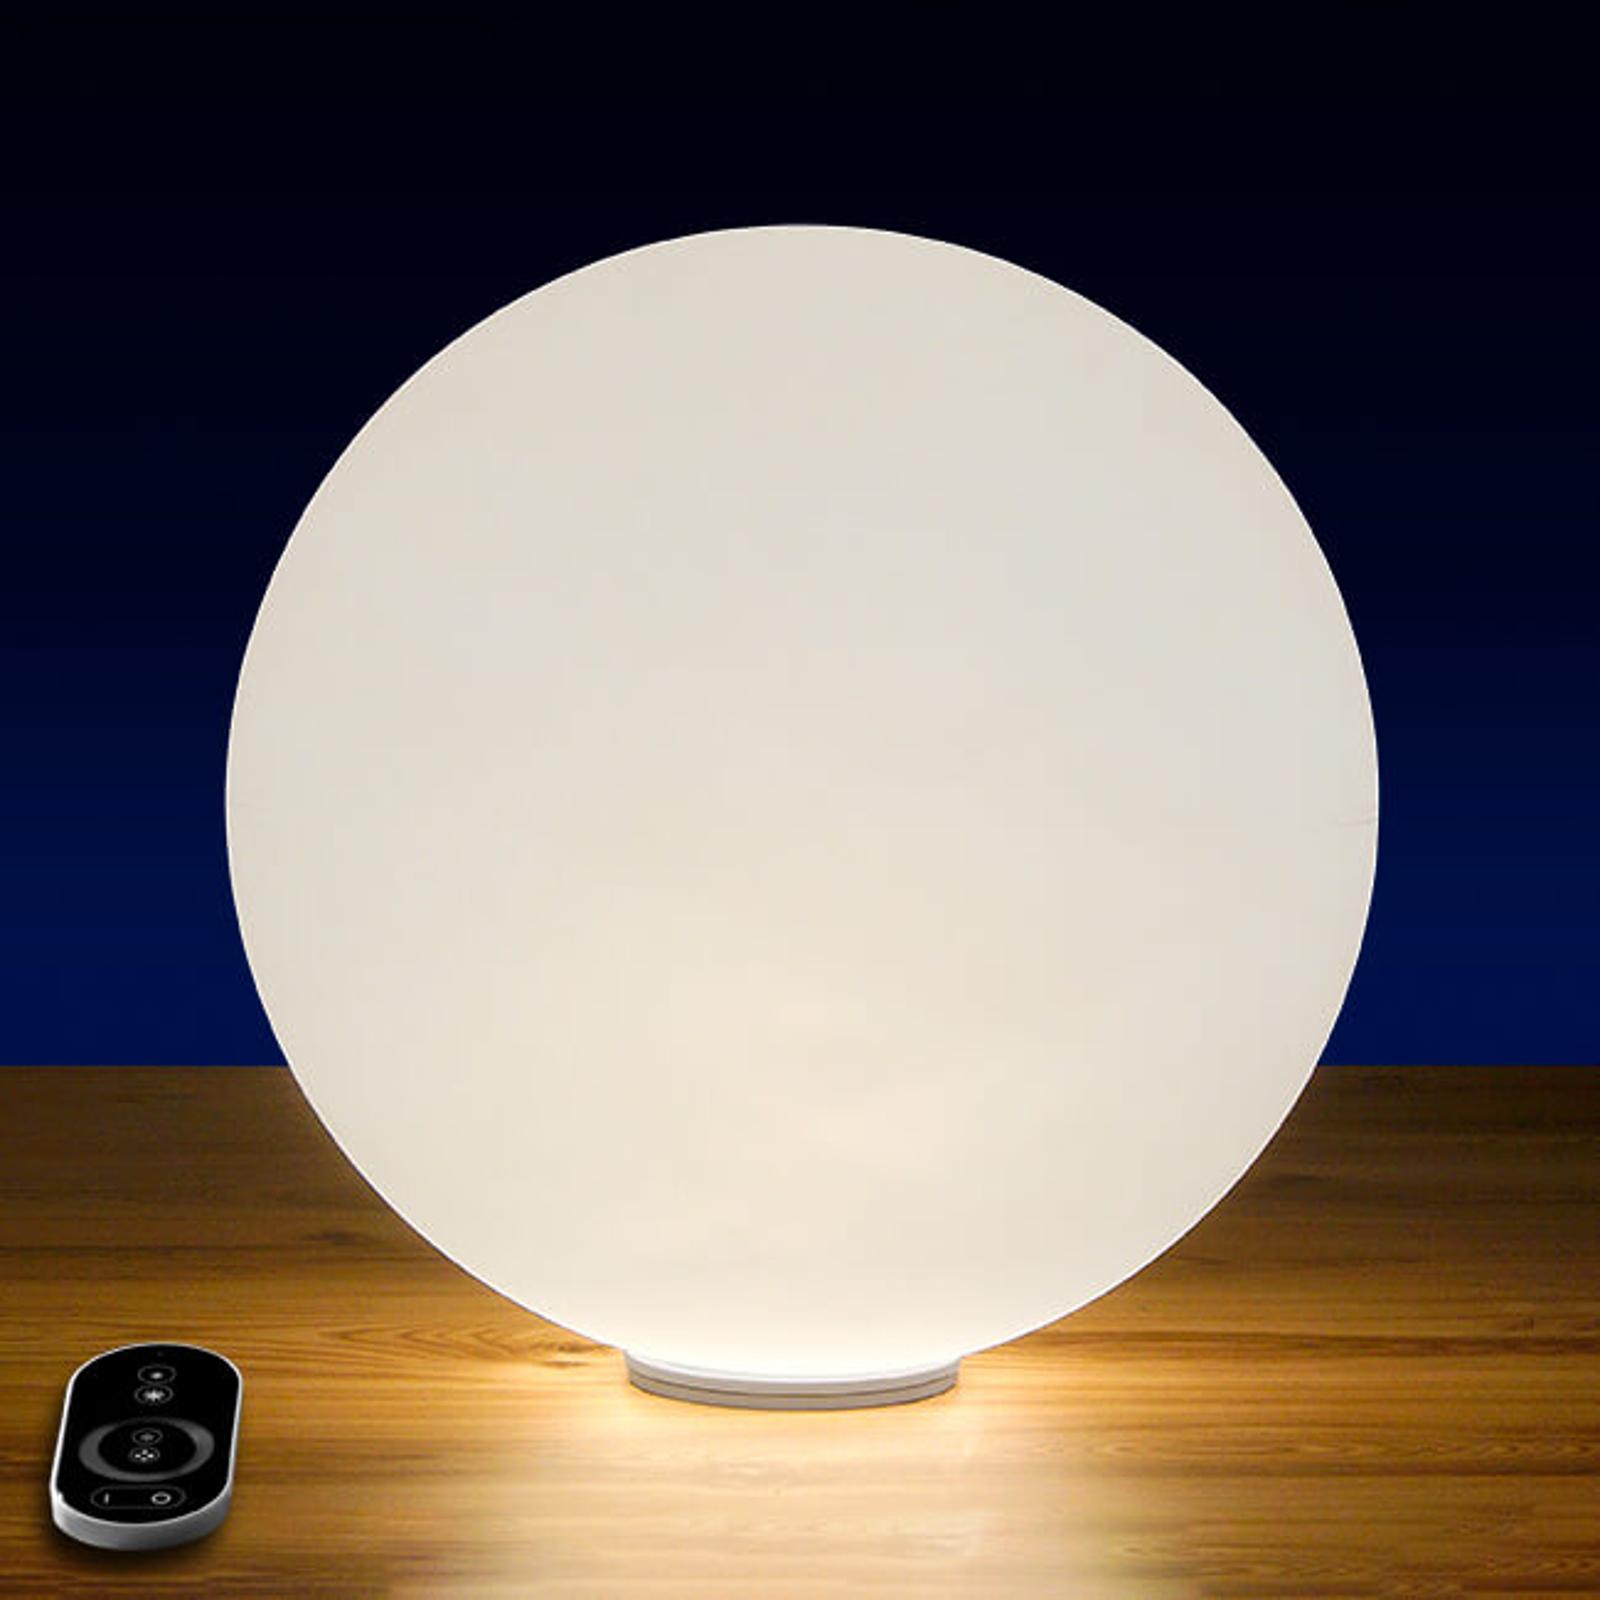 Lampe sphère LED Snowball dimmable batterie, 30cm